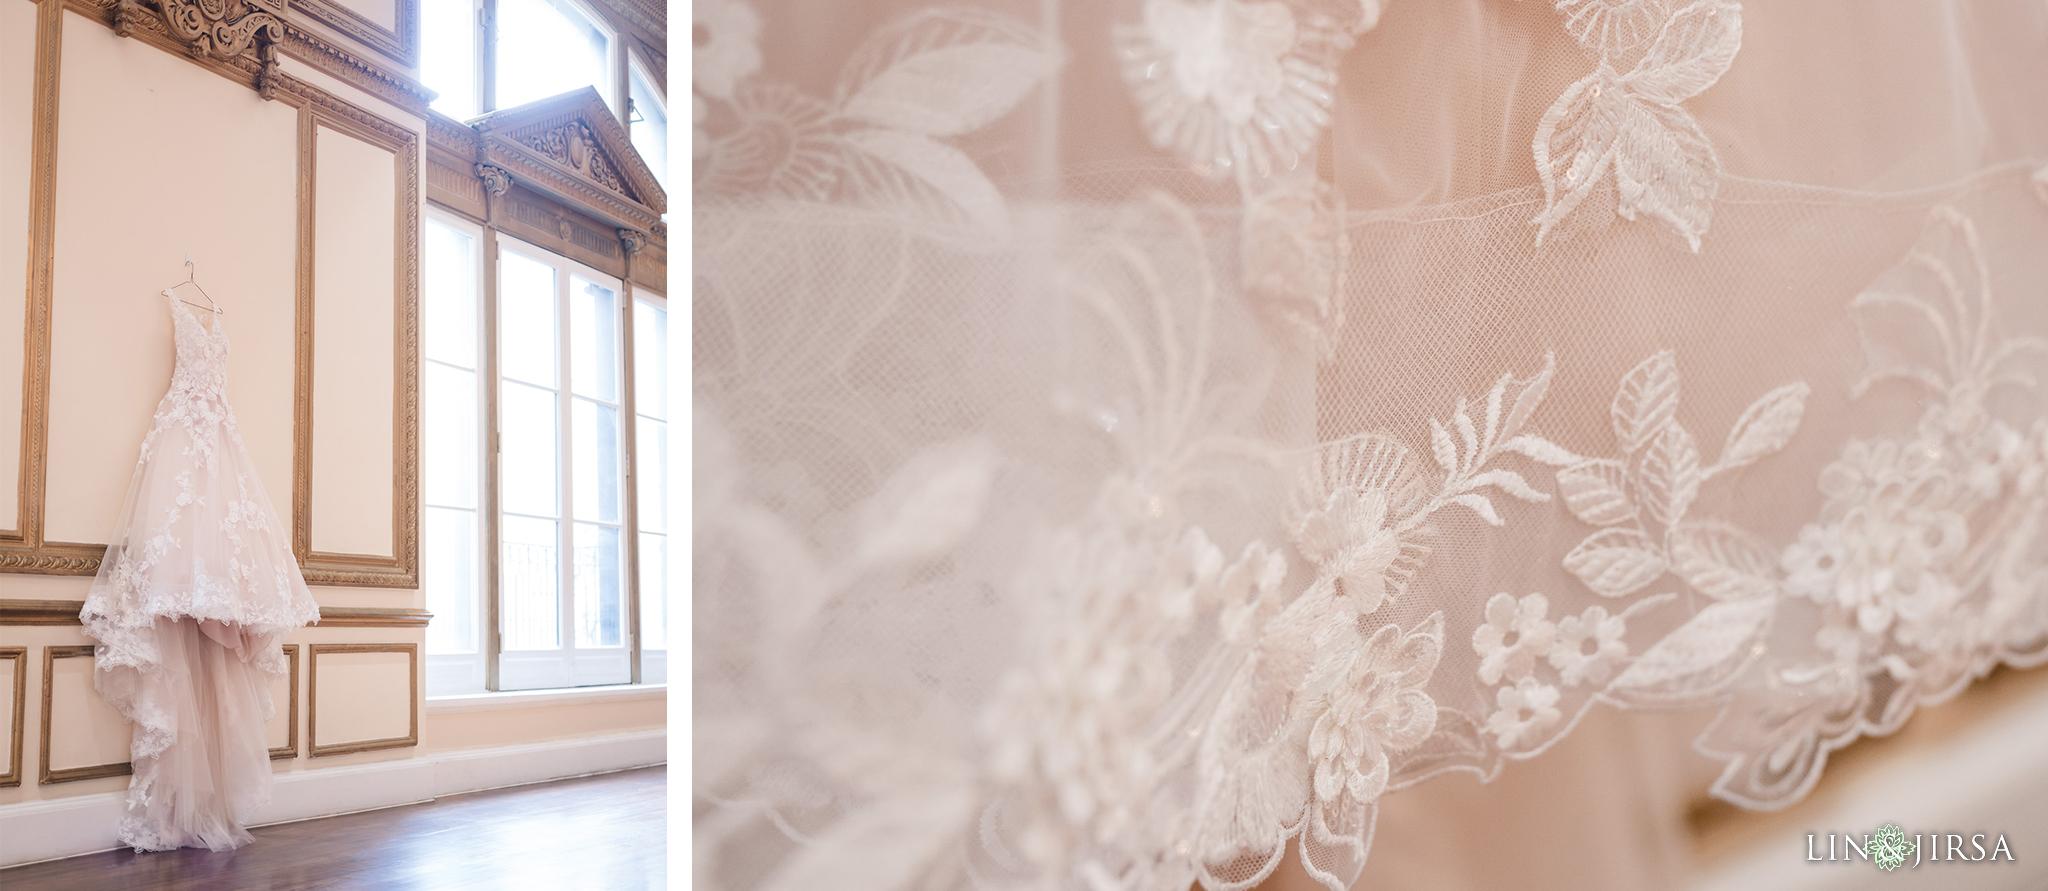 ZJG Alexandria Ballrooms Los Angeles Jewish Wedding Photography